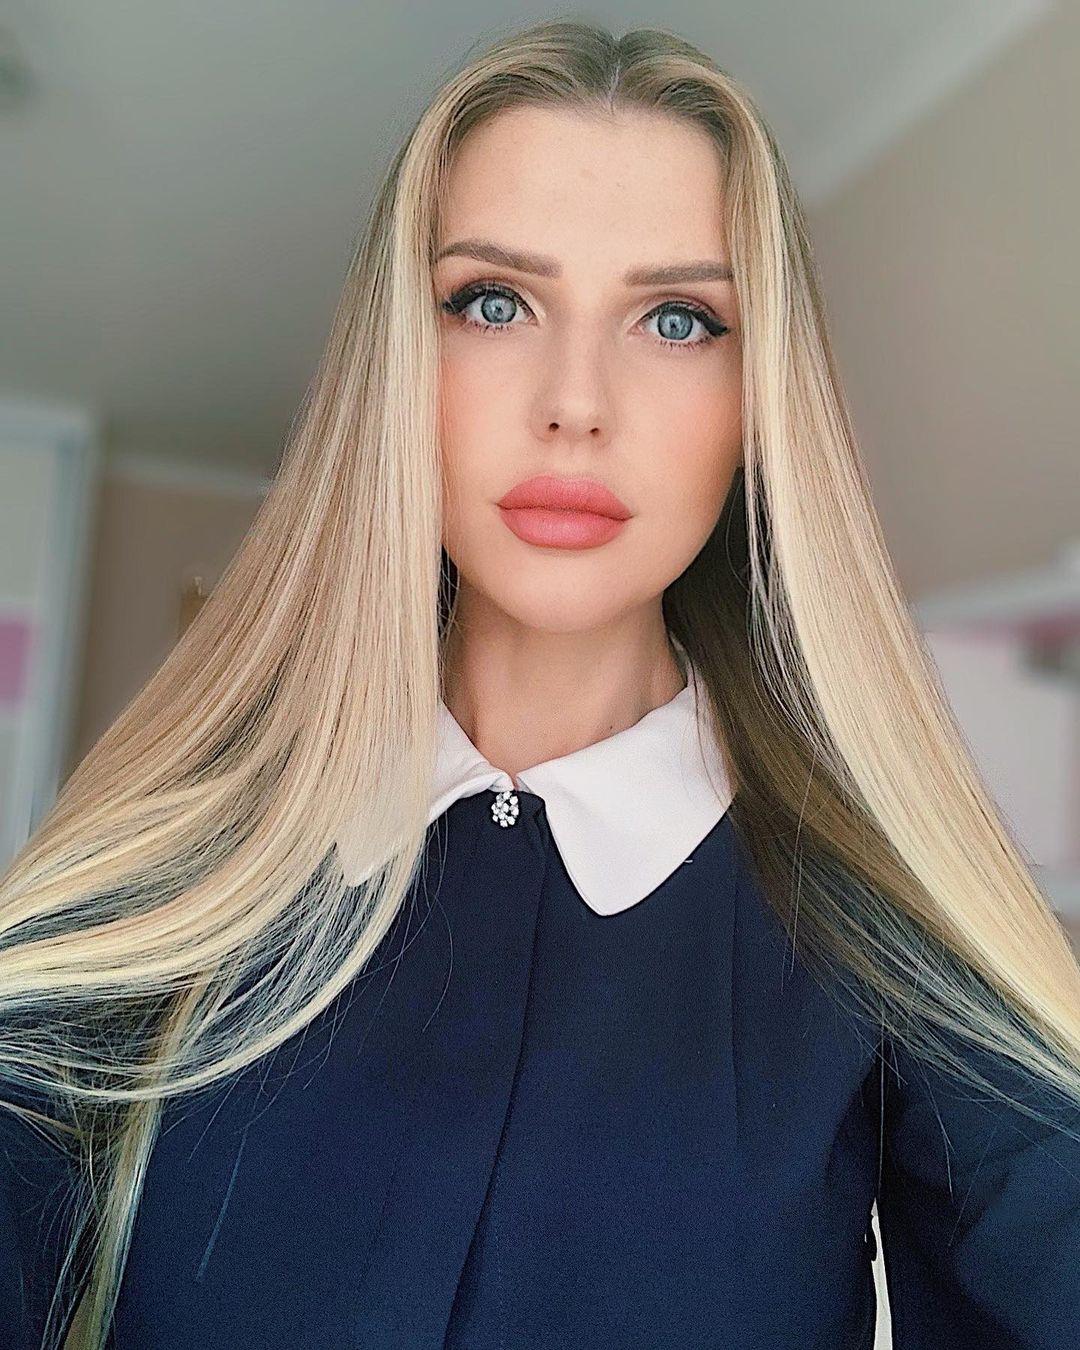 Yuliana-Sholomitskaya-Wallpapers-Insta-Fit-Bio-1